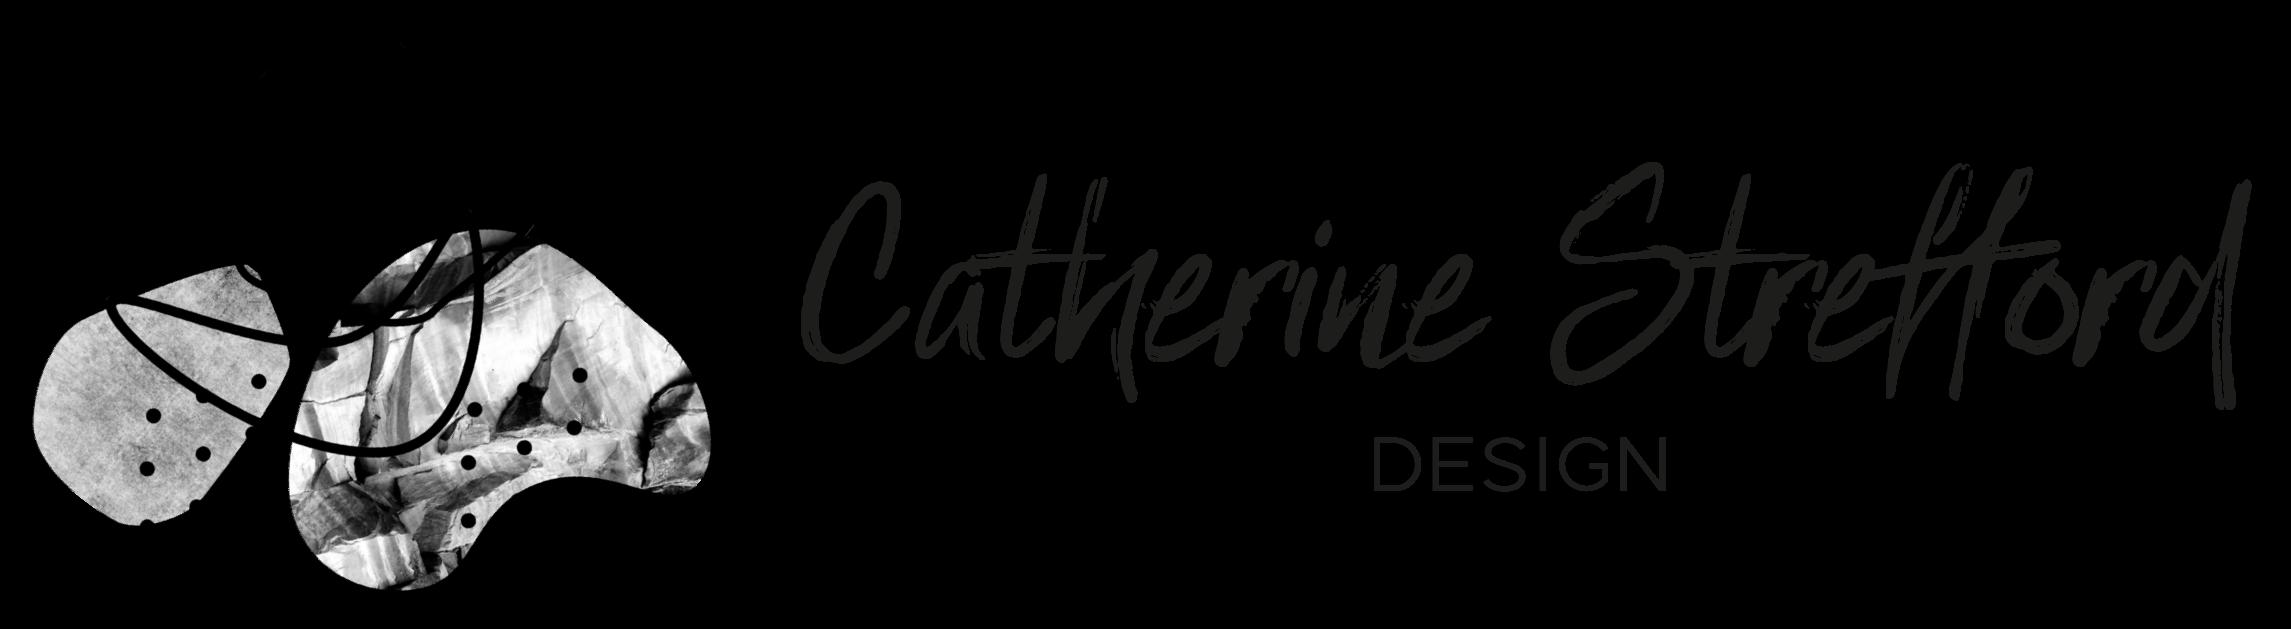 Catherine Strefford Design